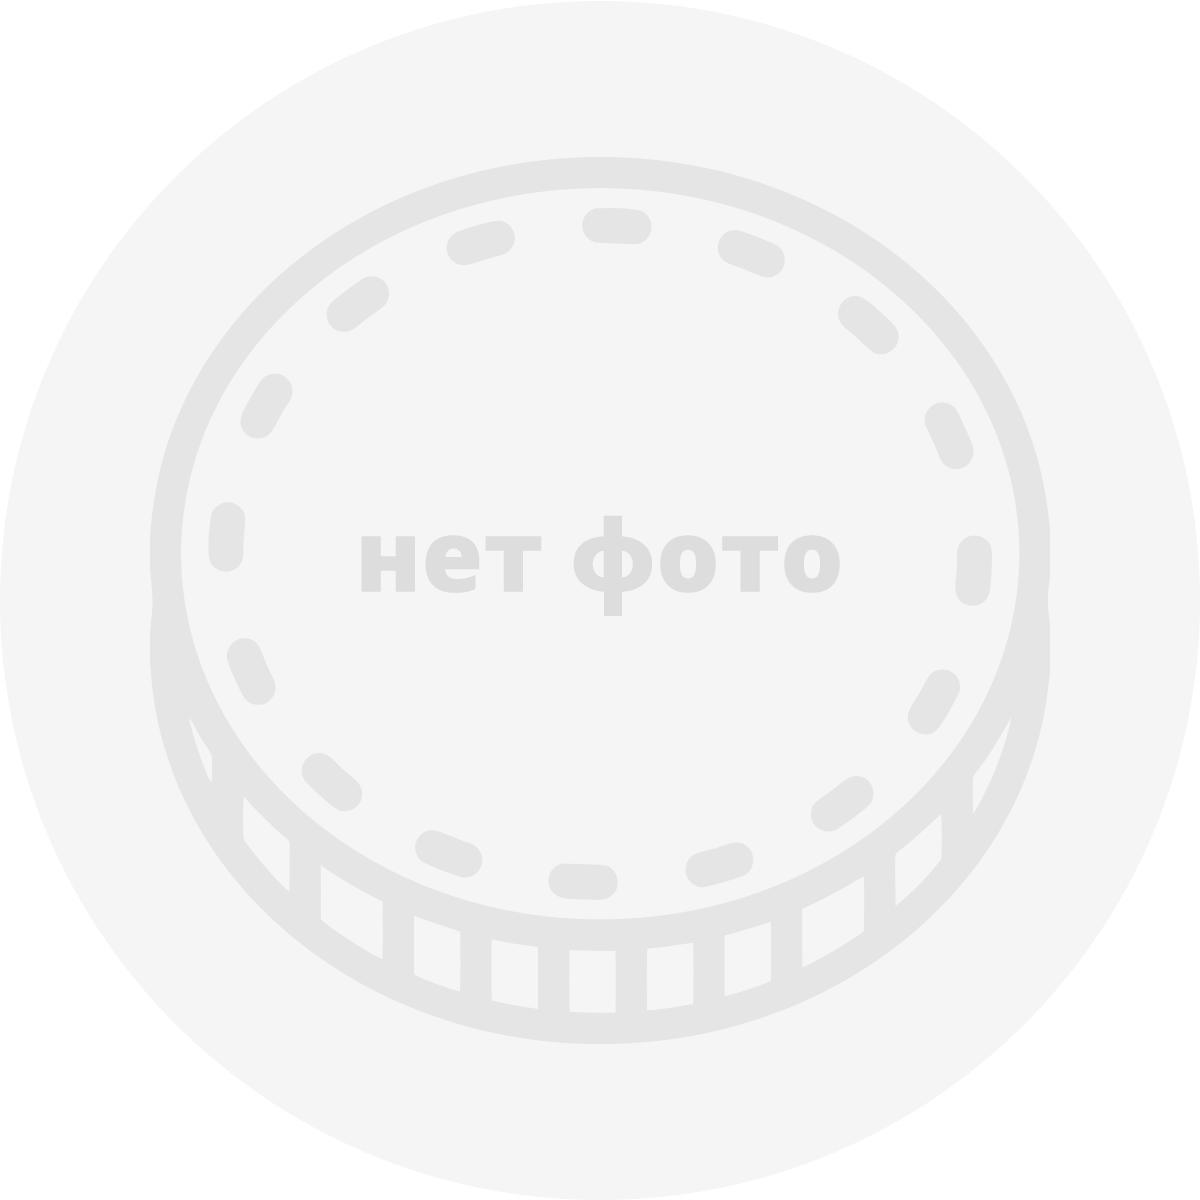 Каталог «Монеты Украины». Максим Загреба.